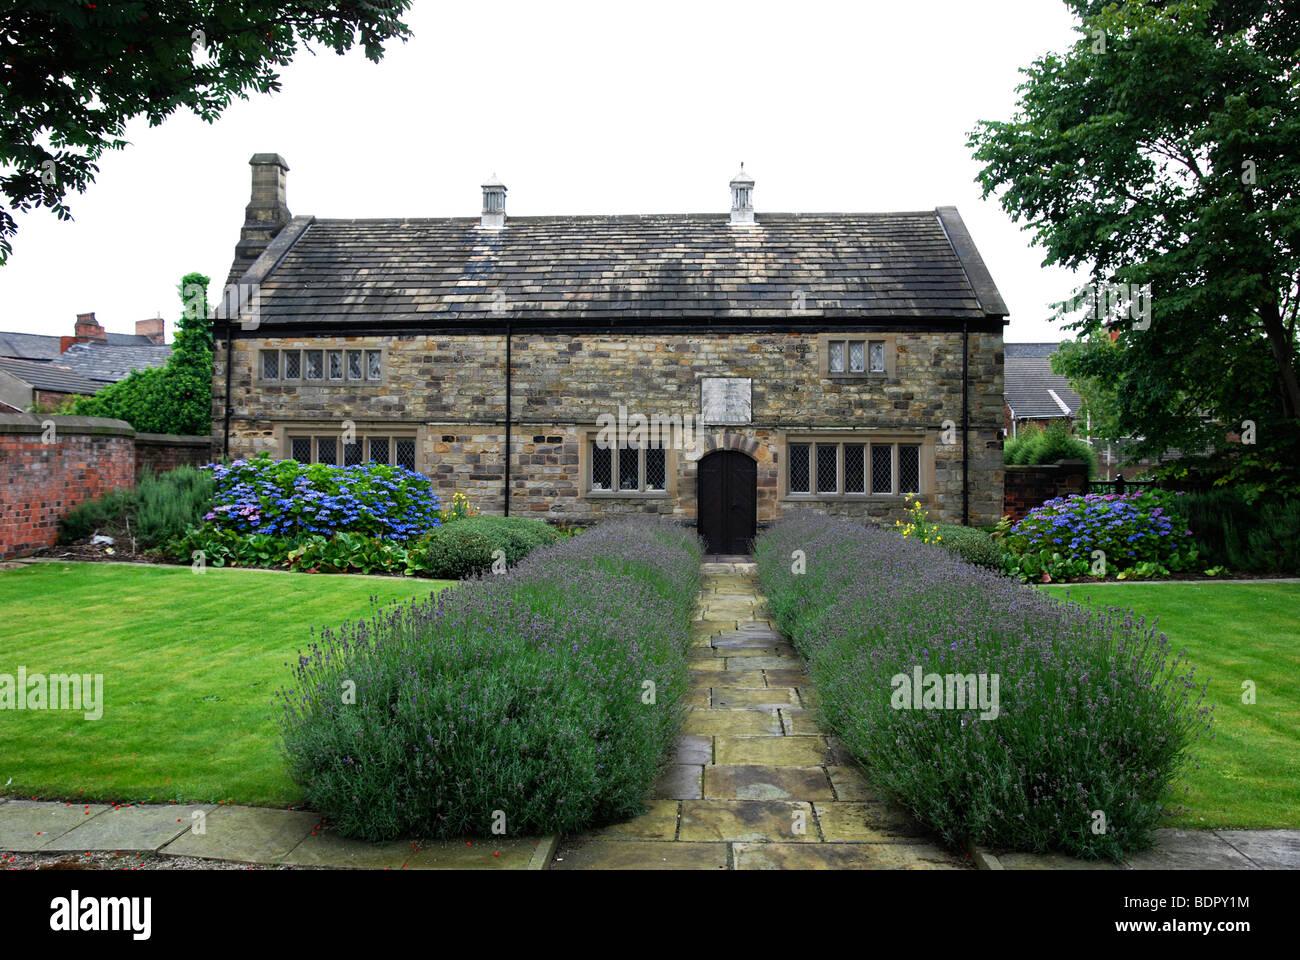 "die ""Gesellschaft der Freunde"" Quäker Versammlungshaus in Nürnberg, Lancashire, uk Stockbild"